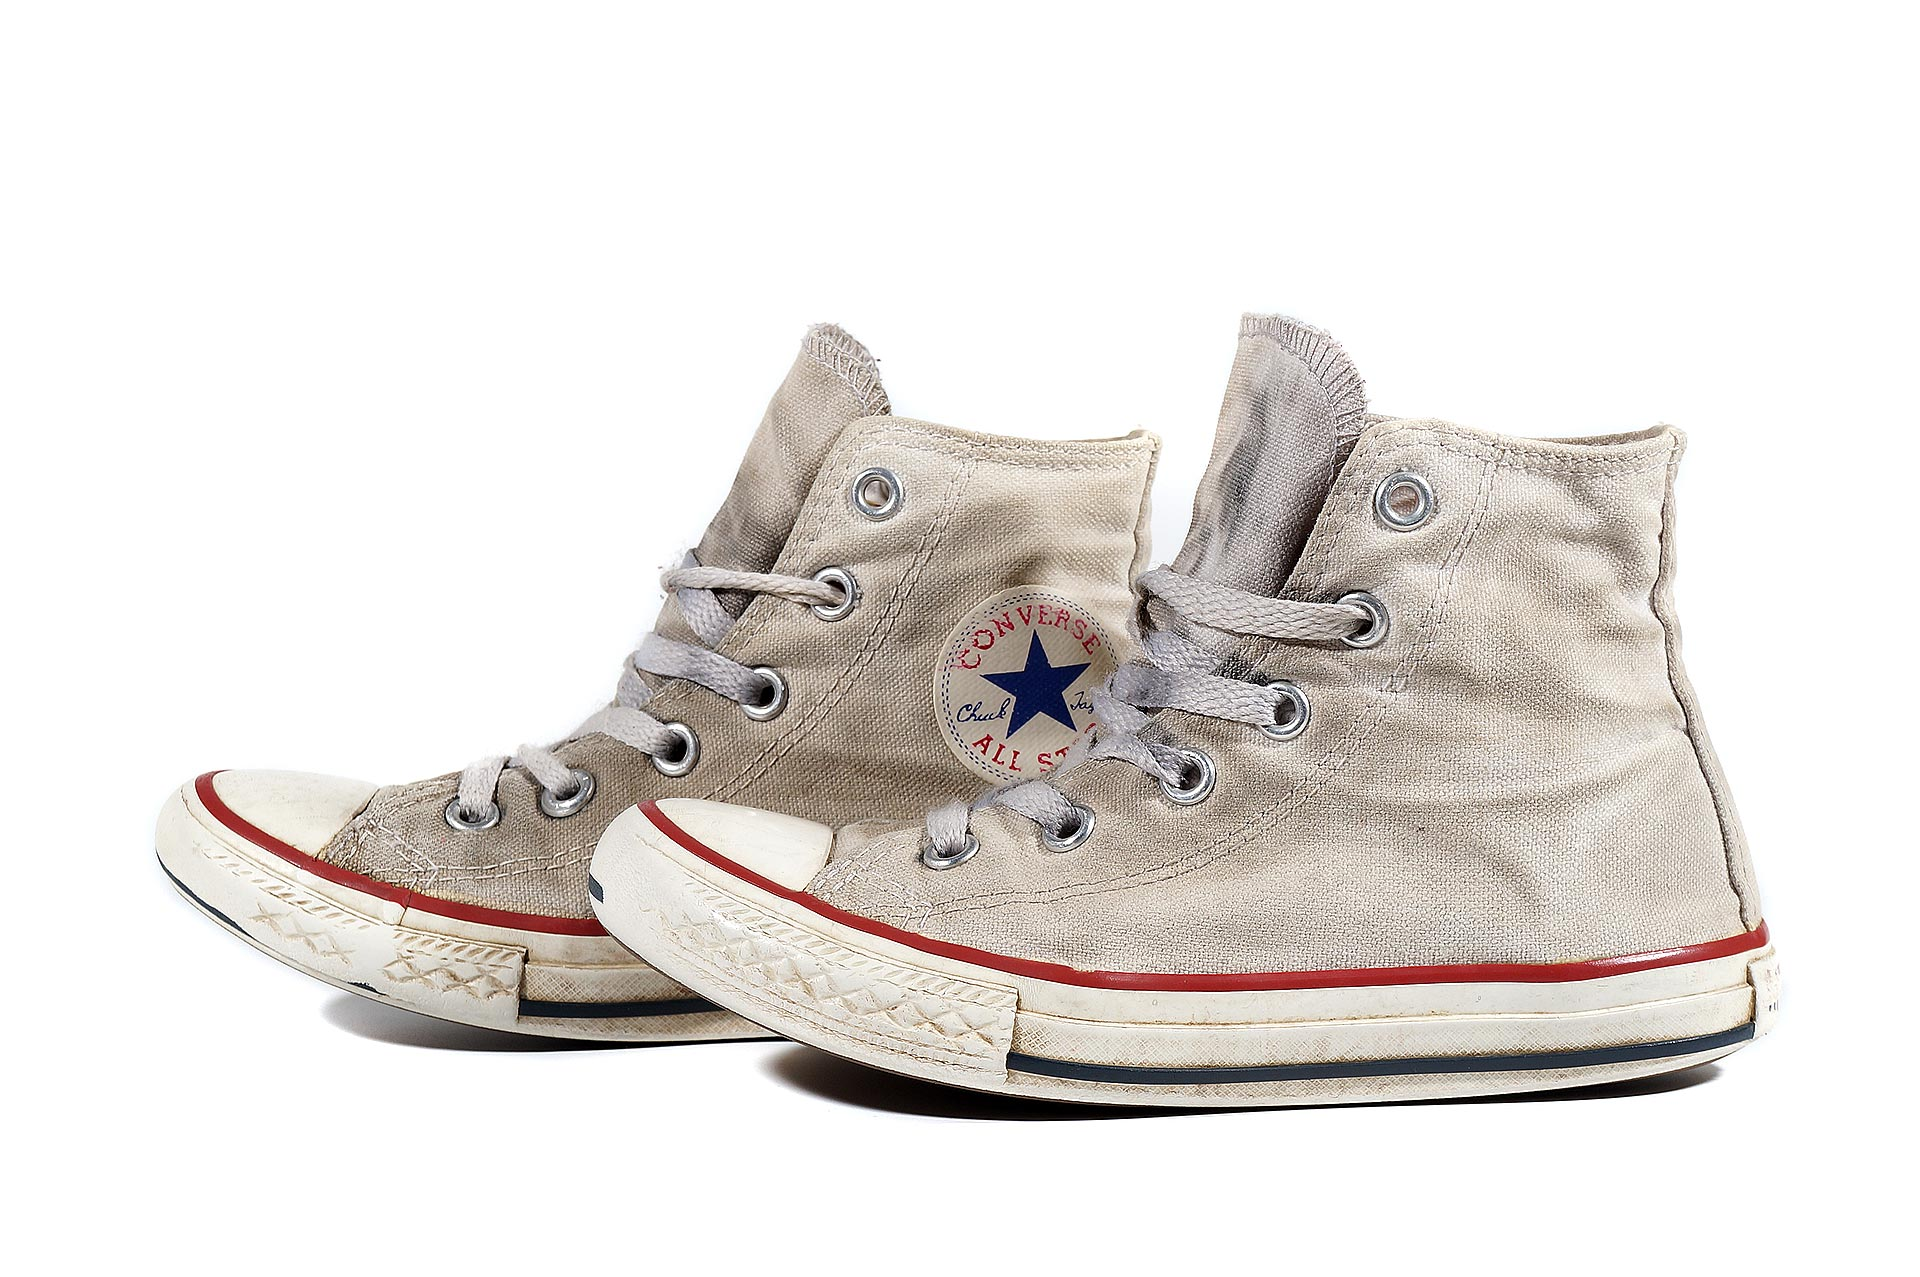 Детские кеды Converse Chuck Taylor All Star 3J253 (00073-U) белые ... 1e9f5d9127c